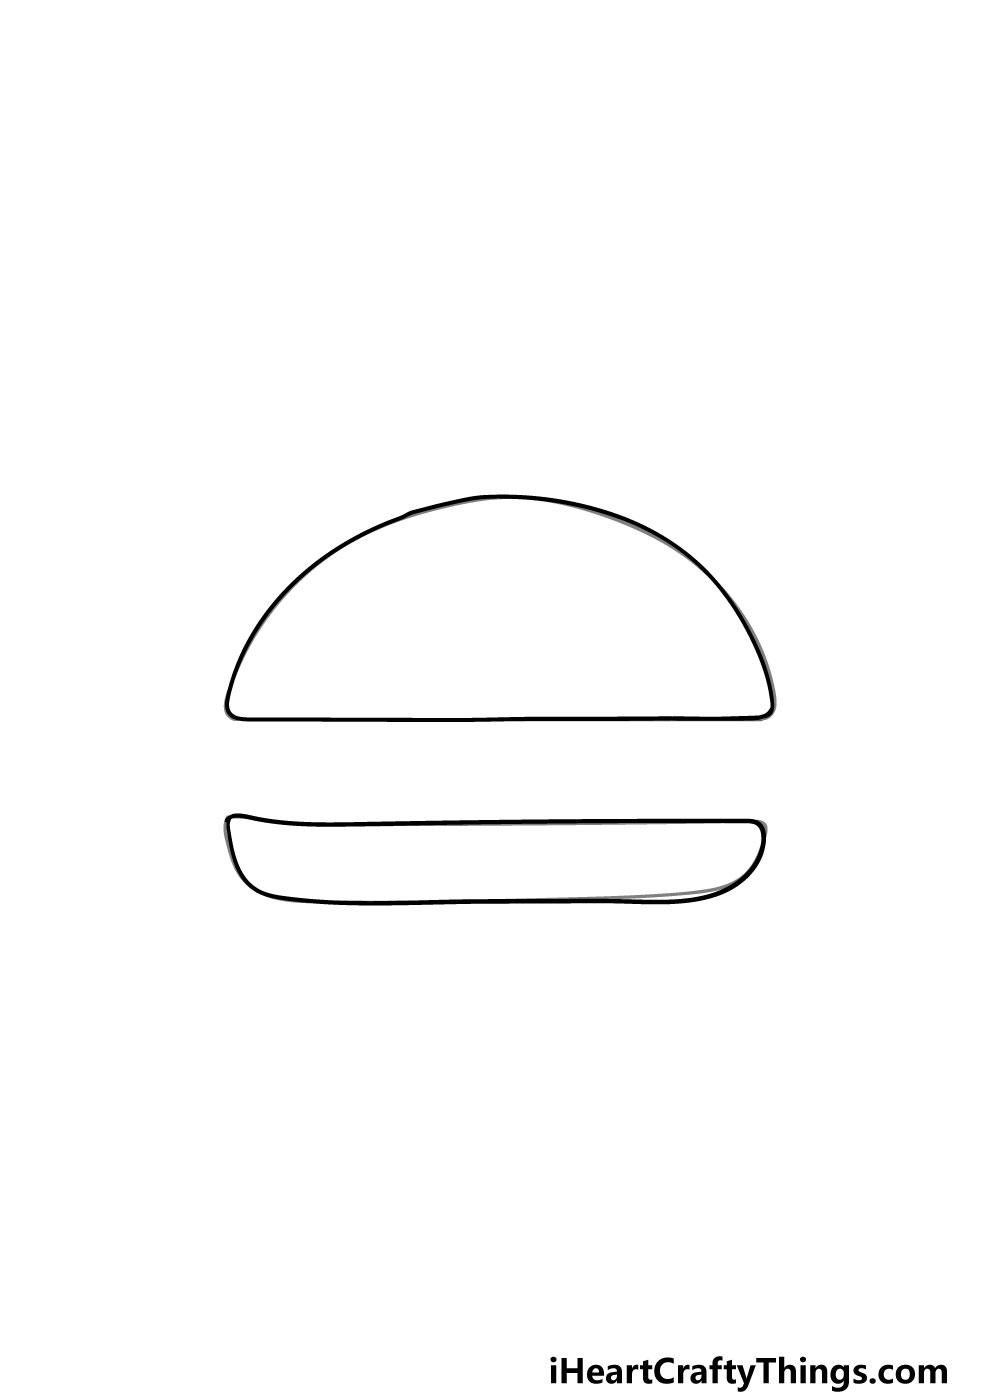 drawing a bun step 2